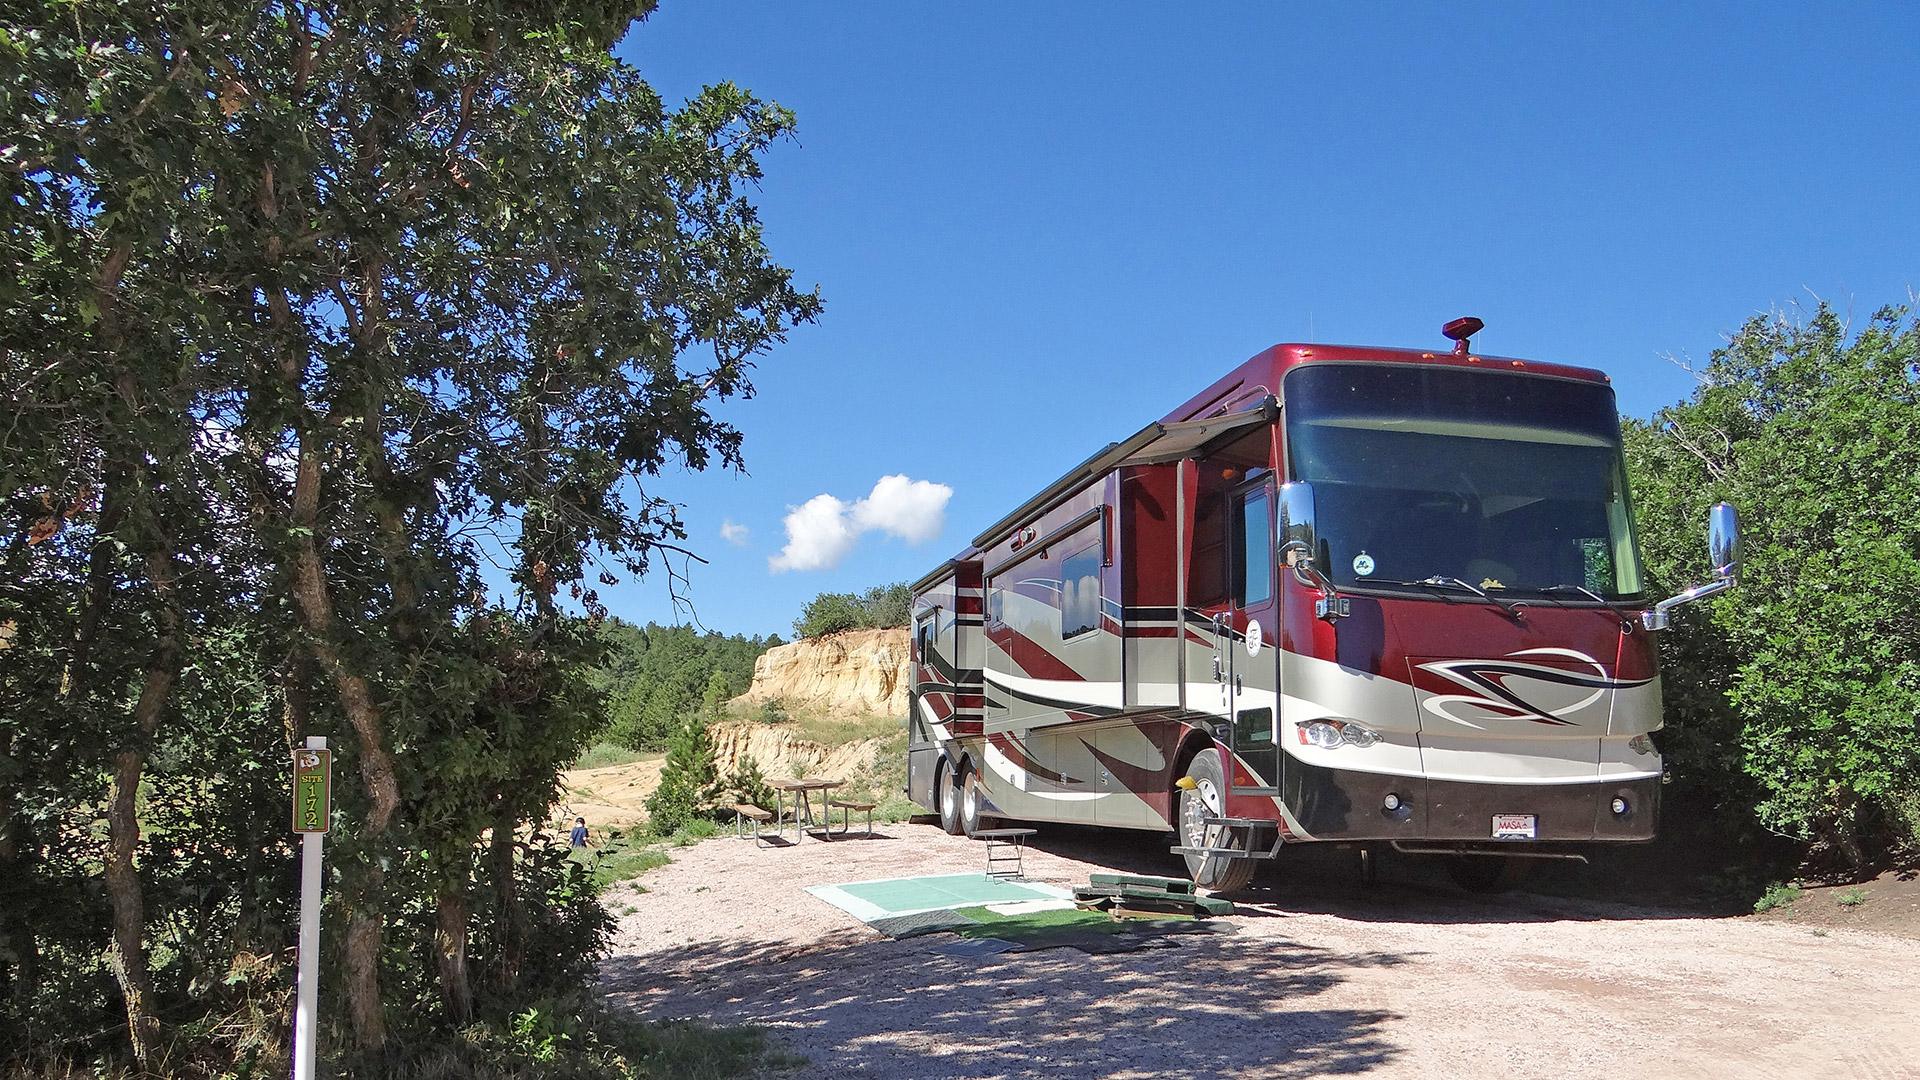 Jellystone Park at Larkspur Colorado 80118